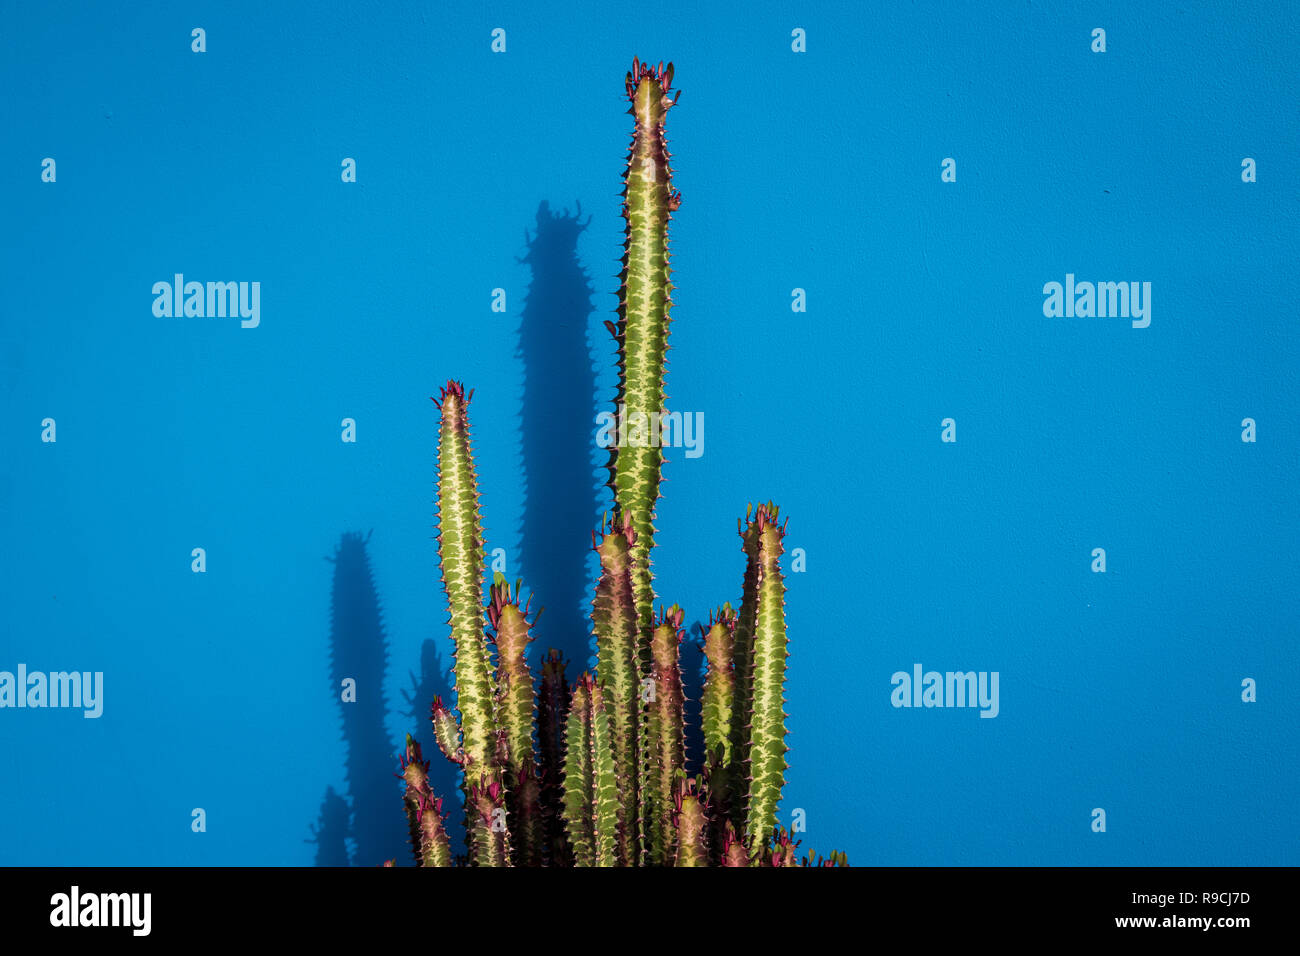 Cactus (Euphorbia Trigona) against a solid blue background. Stock Photo